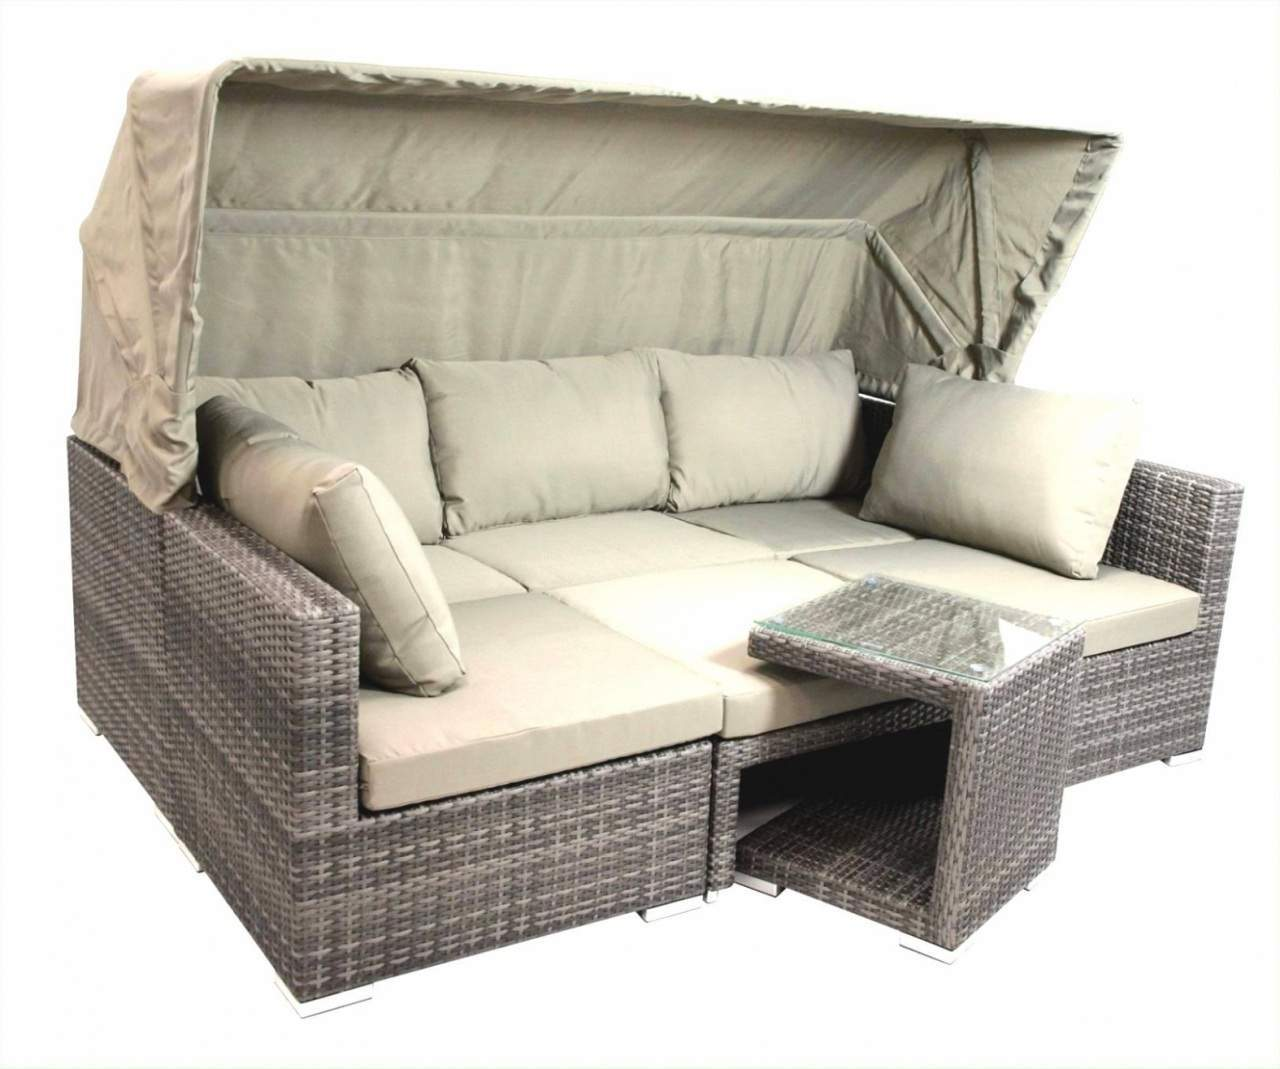 rattan sofa wohnzimmer elegant lounge sessel recamiere shredyr recamiere of rattan sofa wohnzimmer